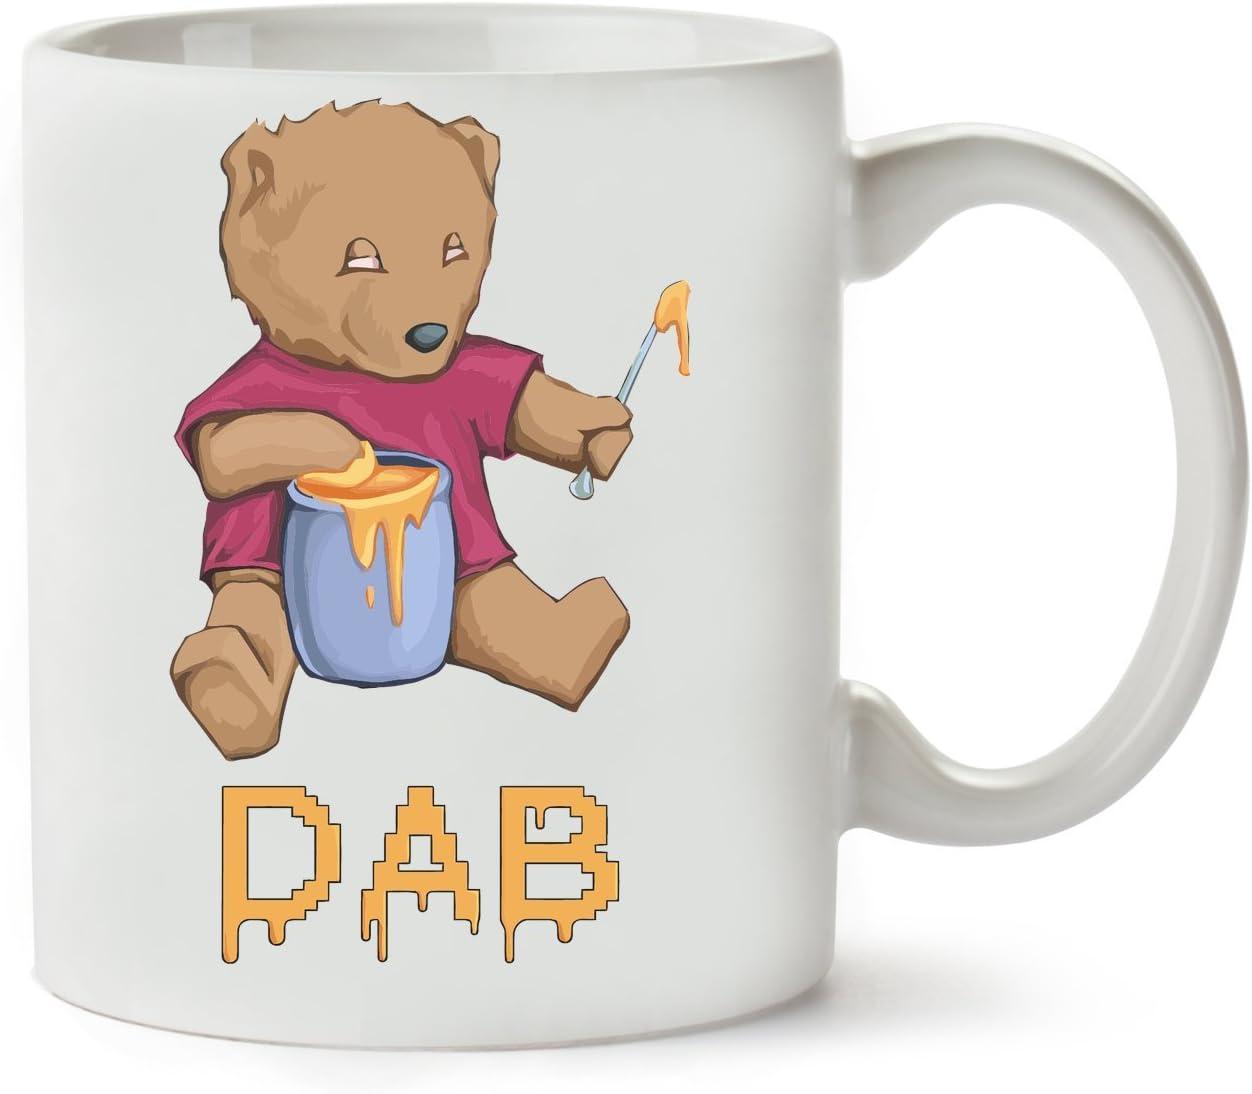 PC Hardware Store Dab Taza para Café Y Té